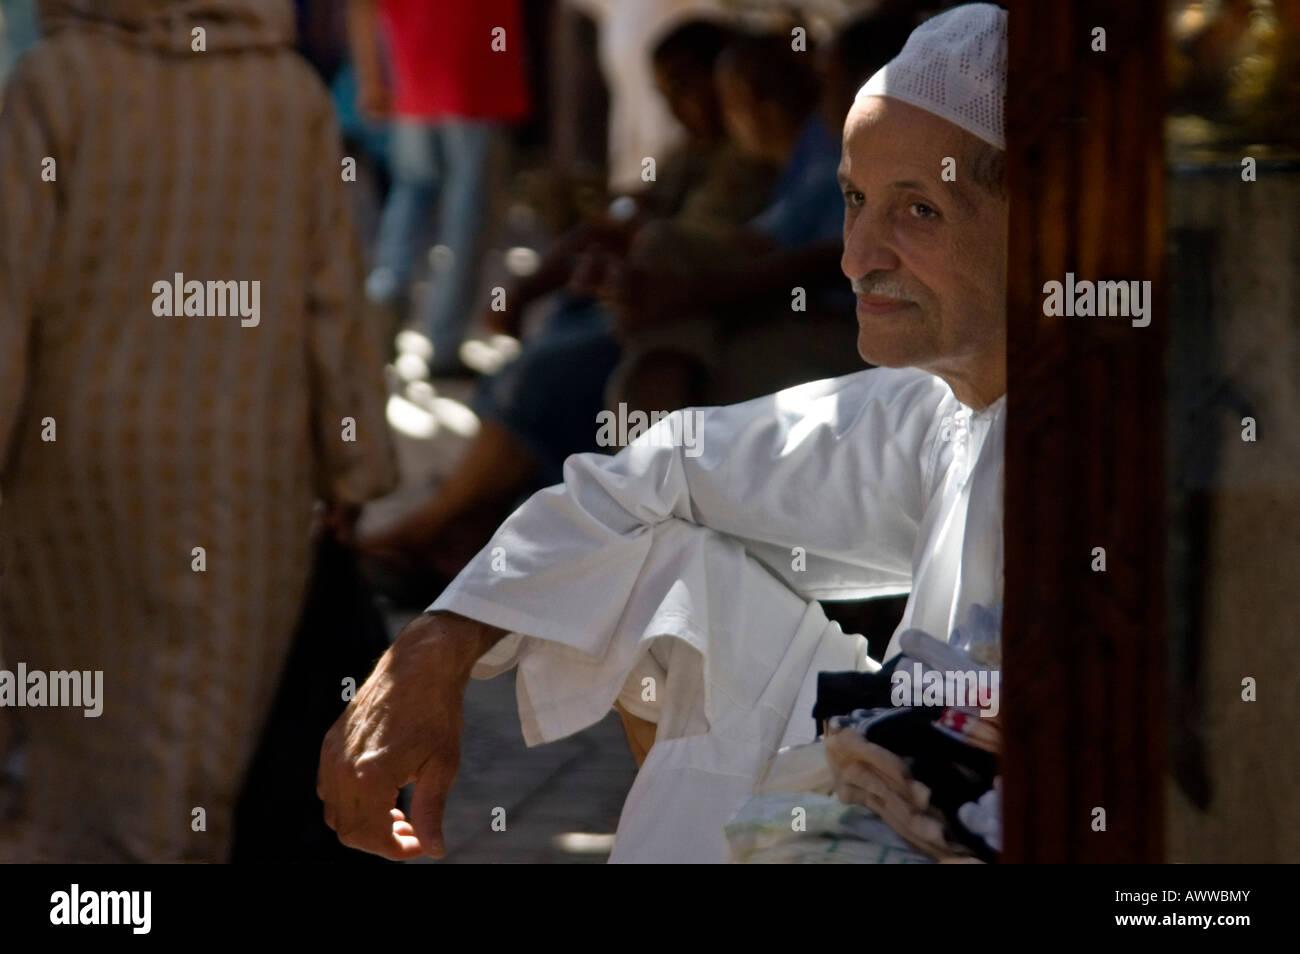 0a713214e838d Vertical horizontal de un anciano musulmán varón tendero de un blanco  inmaculado kaftan sentado fuera Imagen